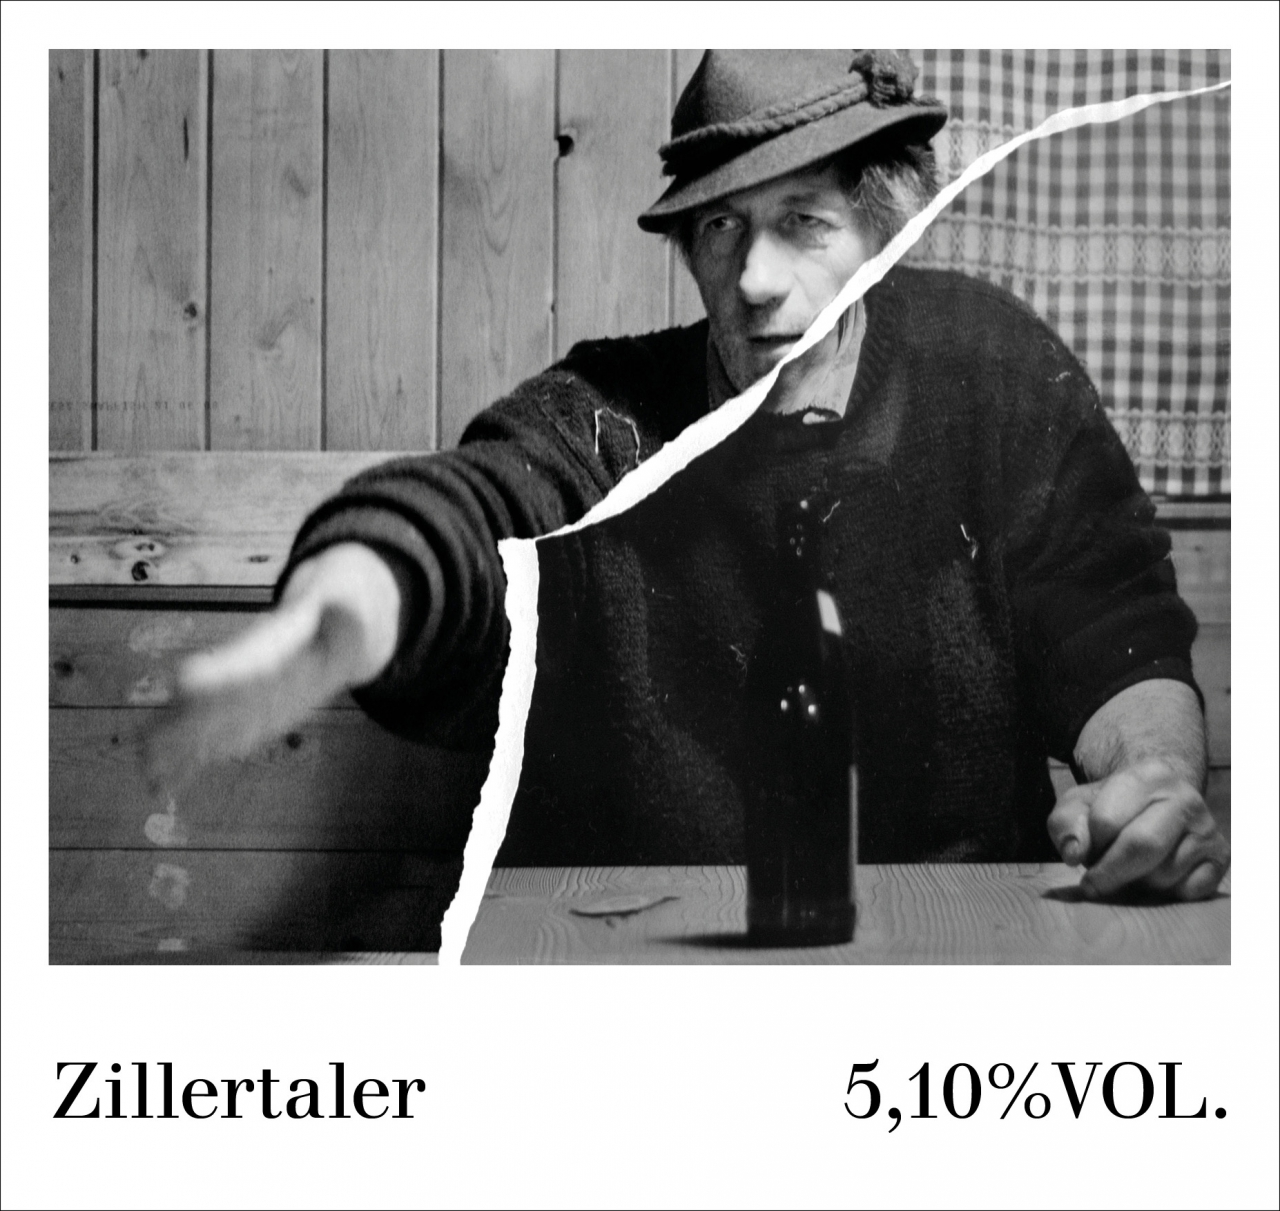 Designbüro Mittelsdorf 5,10%VOL. → Grafikdesign, Fotografie, Poster